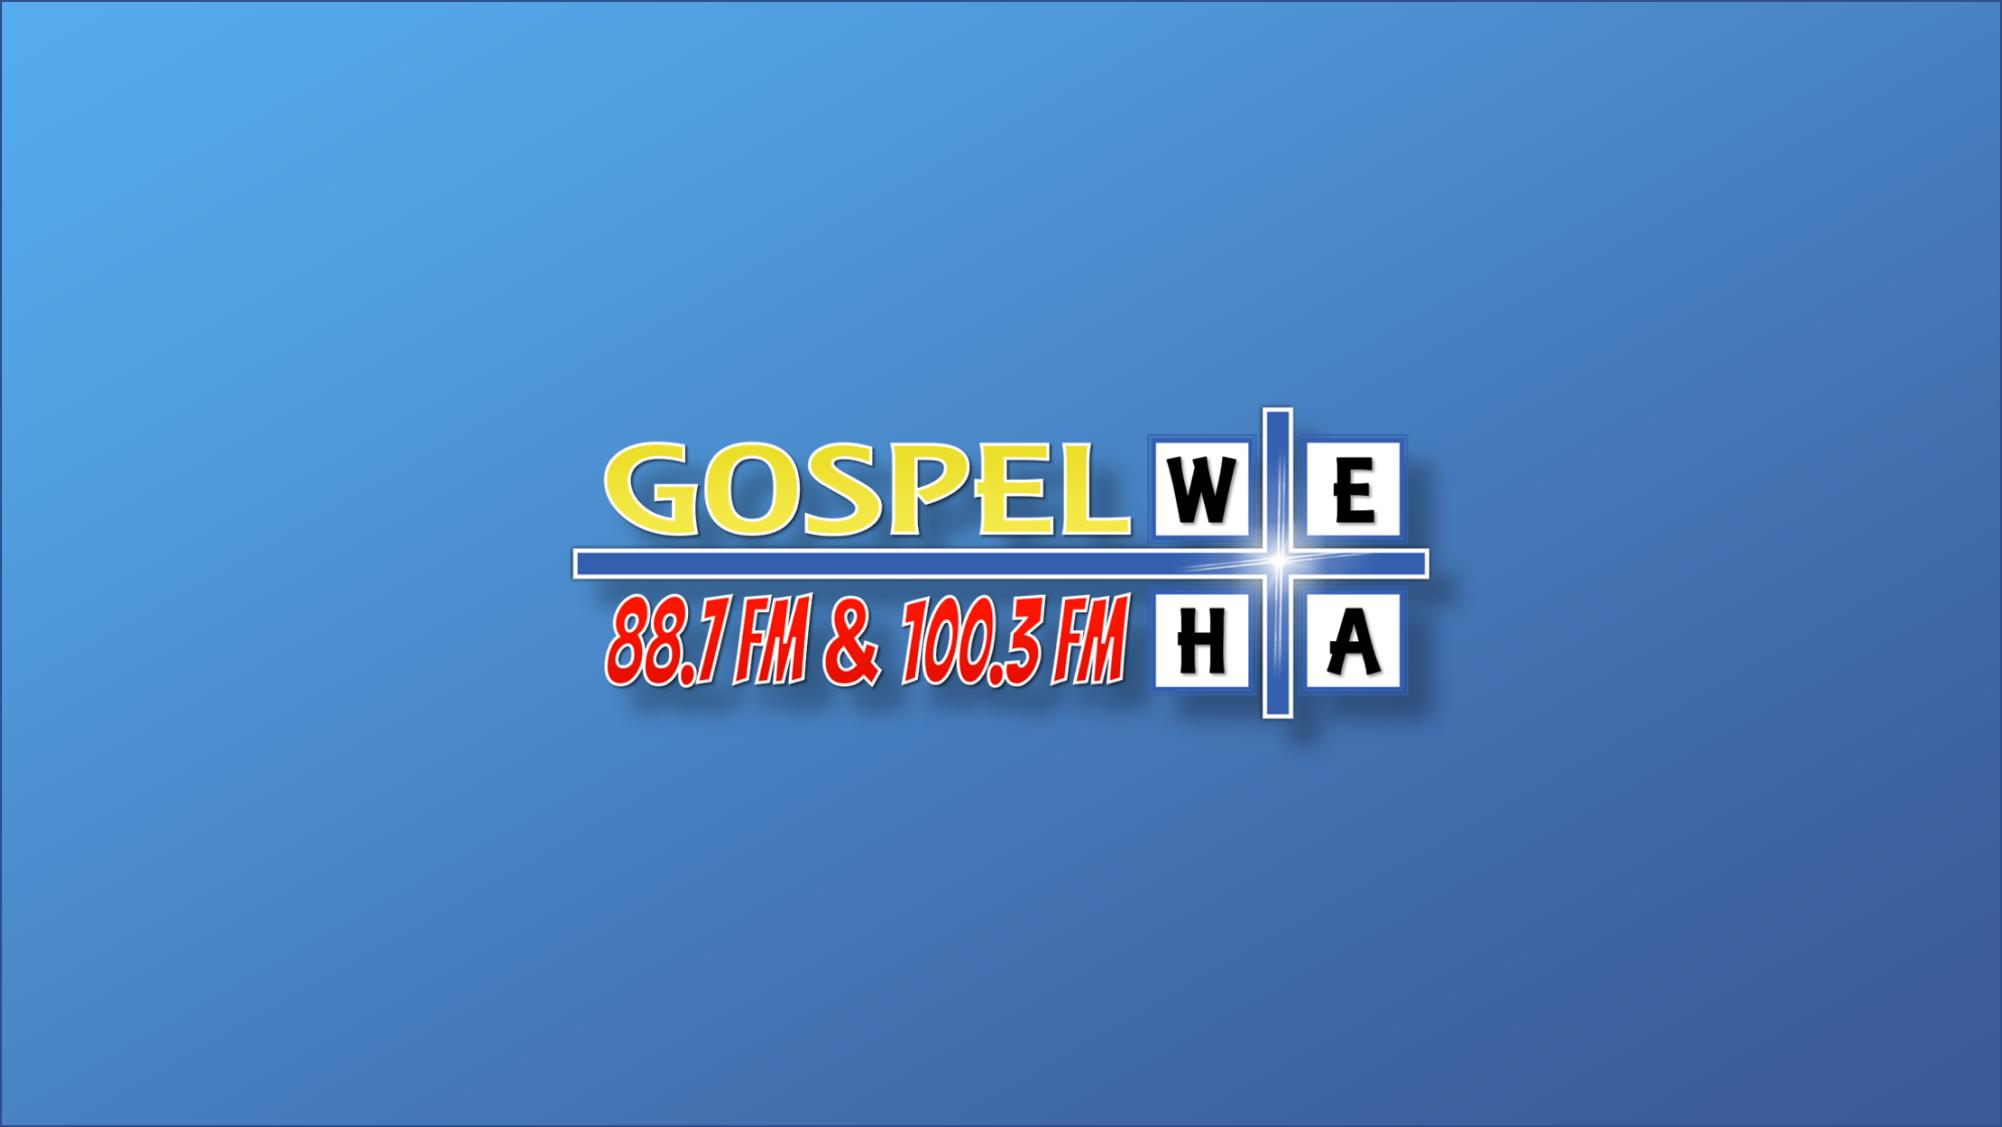 CONTACT US | Gospel Music | United States | We Have Gospel